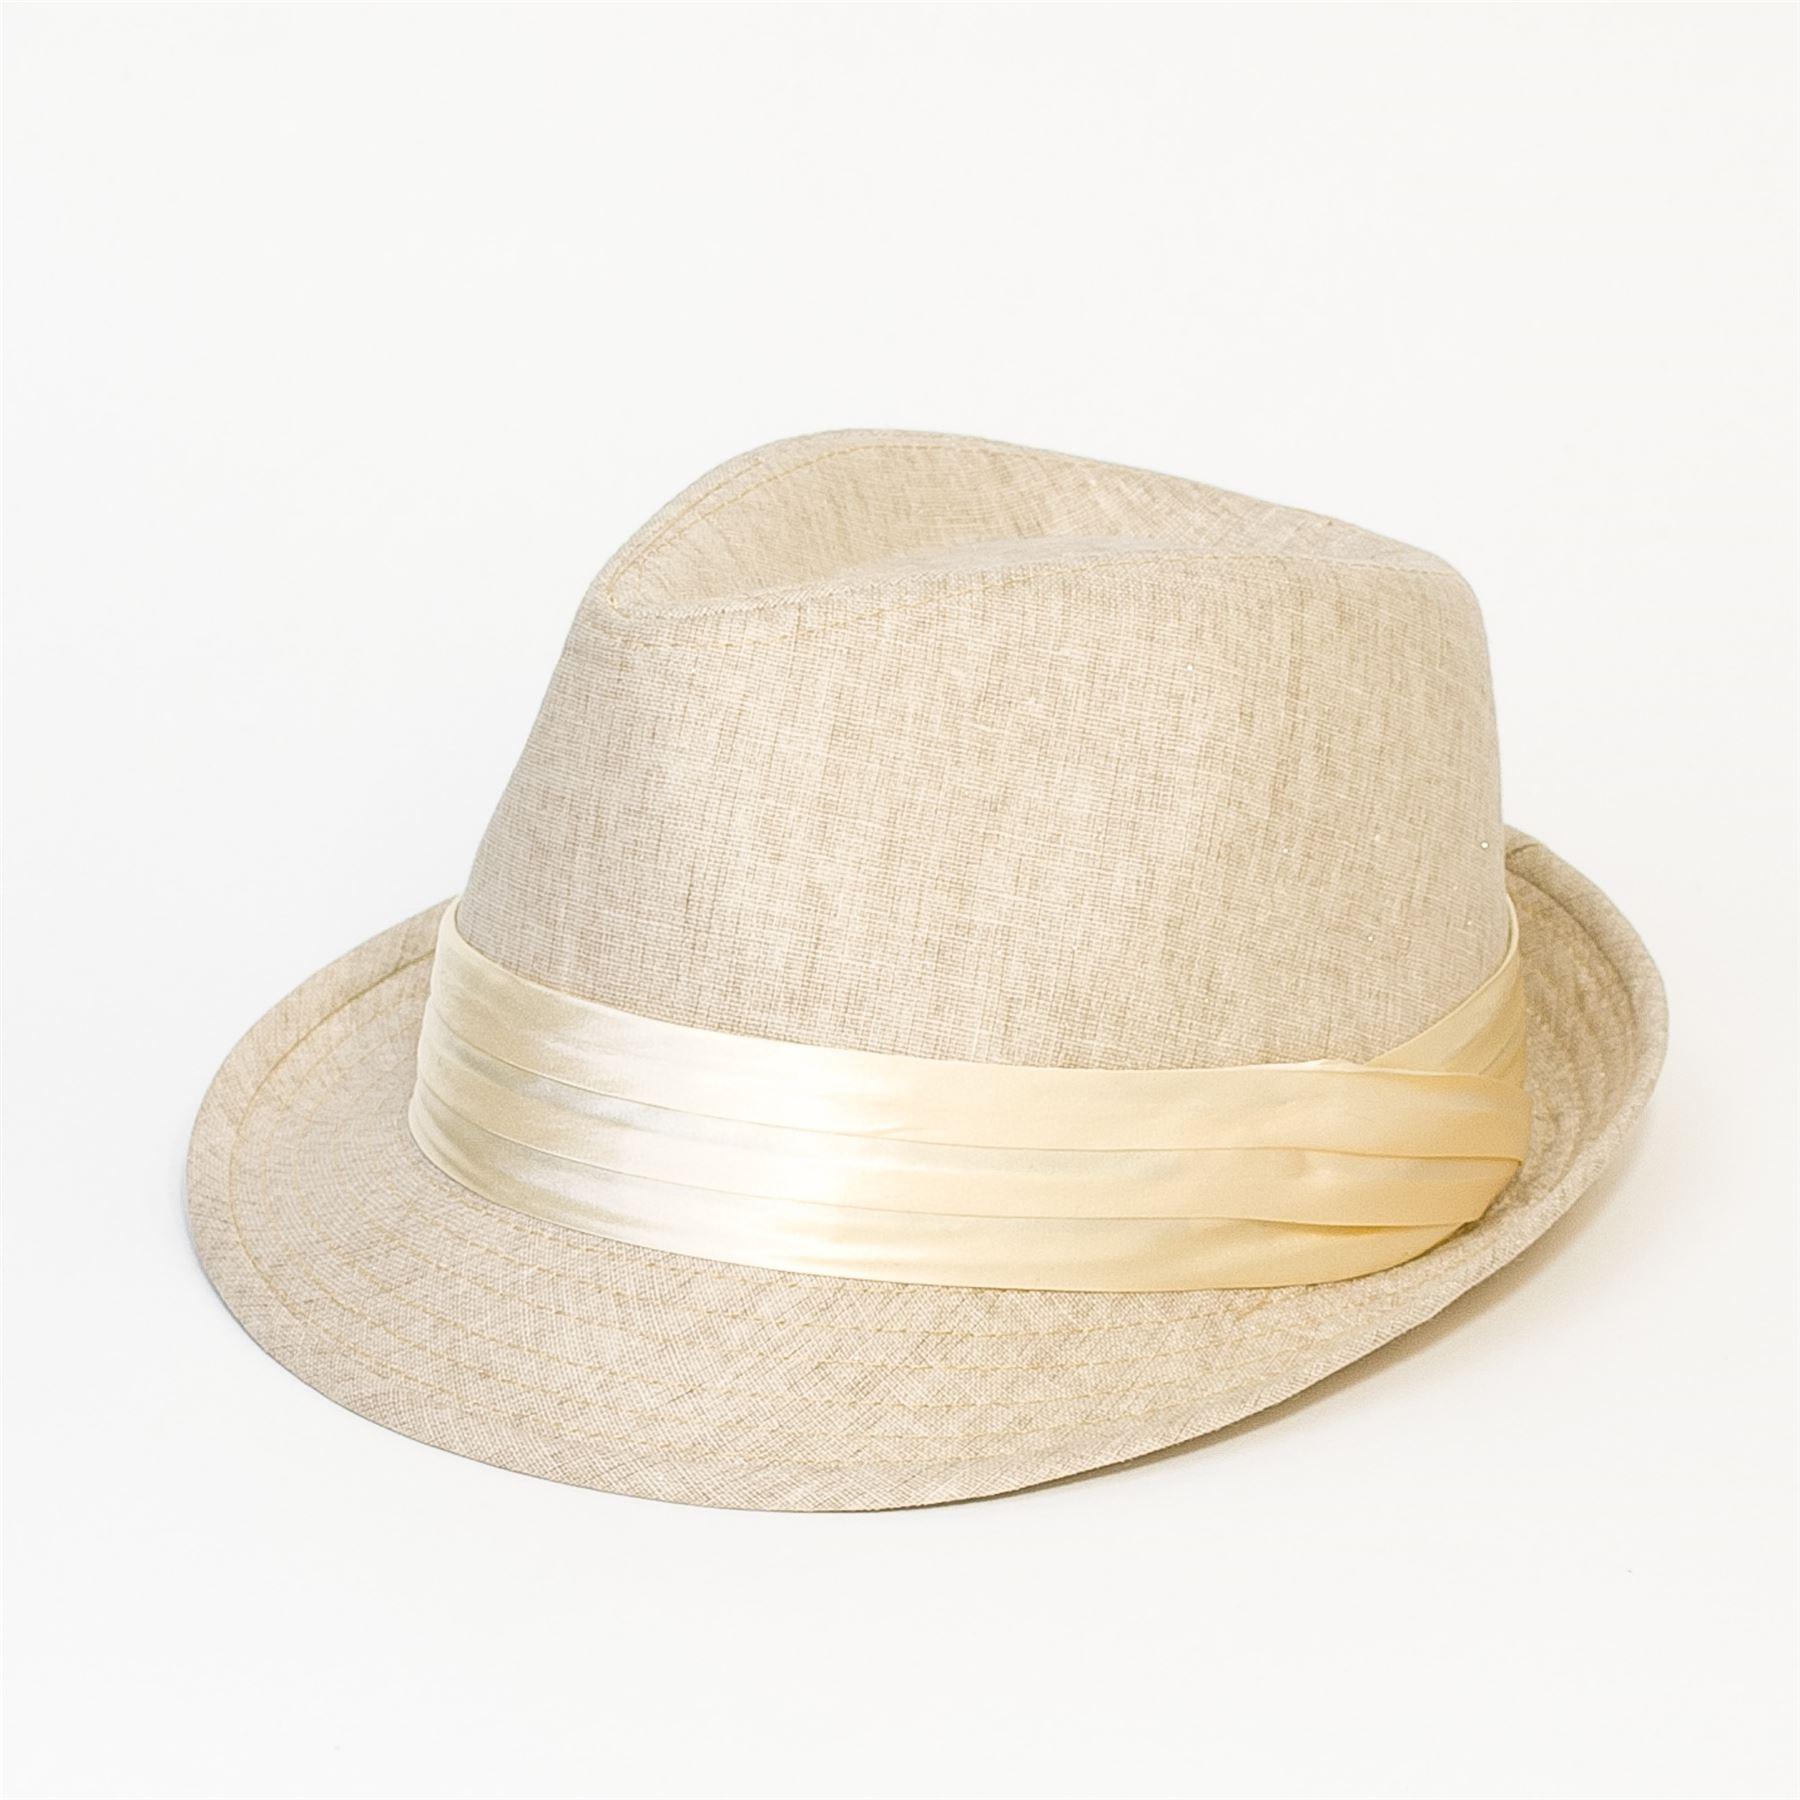 Plain Mens Women Felt Fedora Trilby Unisex Hat Cap Gun Metal Silver Band